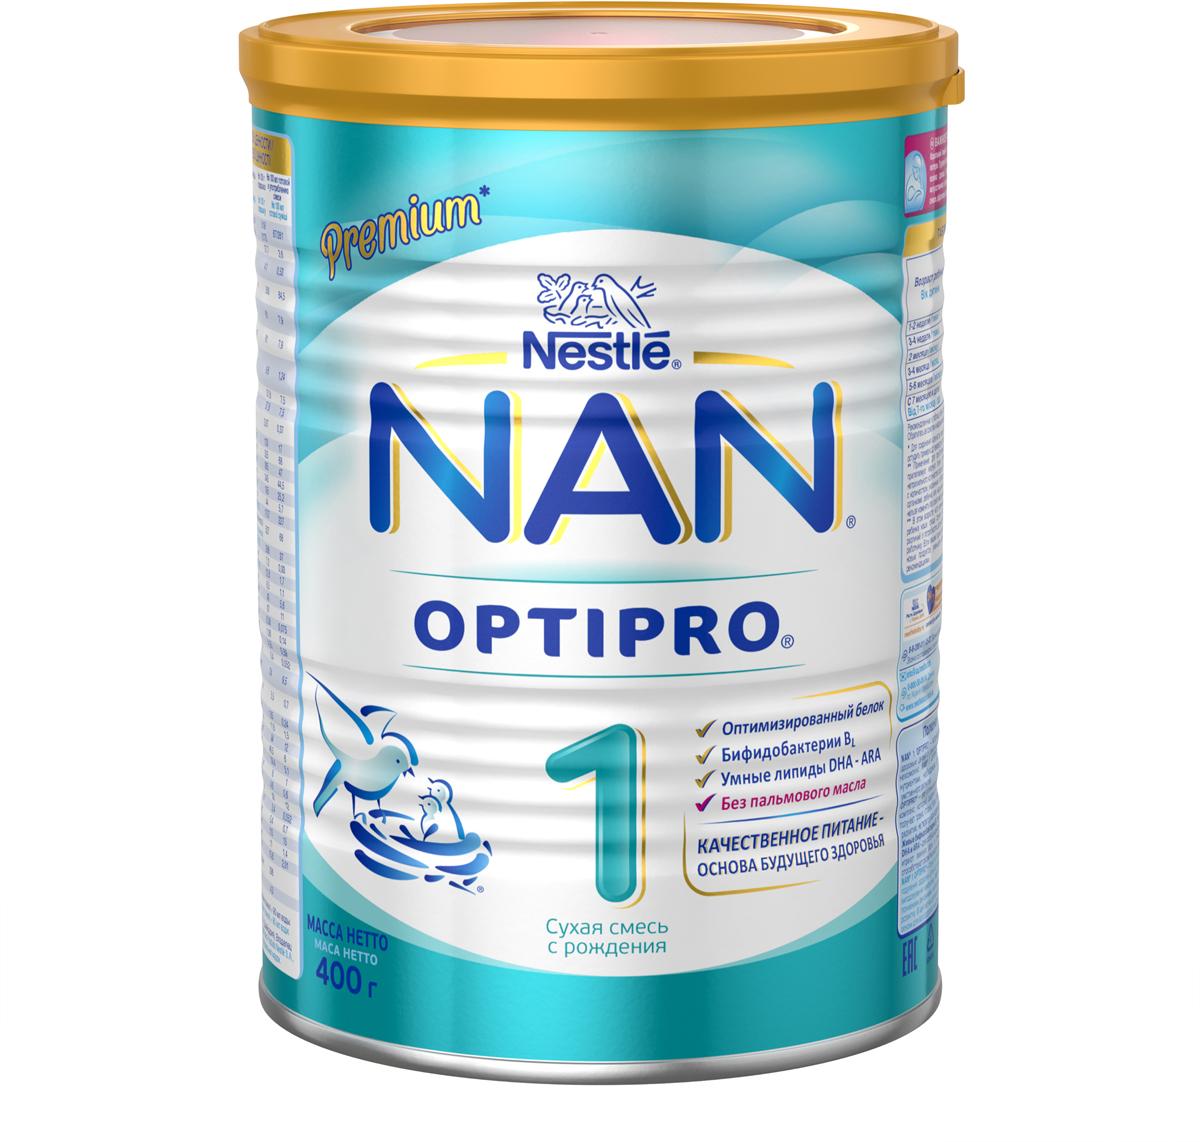 NAN 1 OPTIPRO смесь молочная, с рождения 400 г молочная смесь nan 1 optipro с рождения 800 г